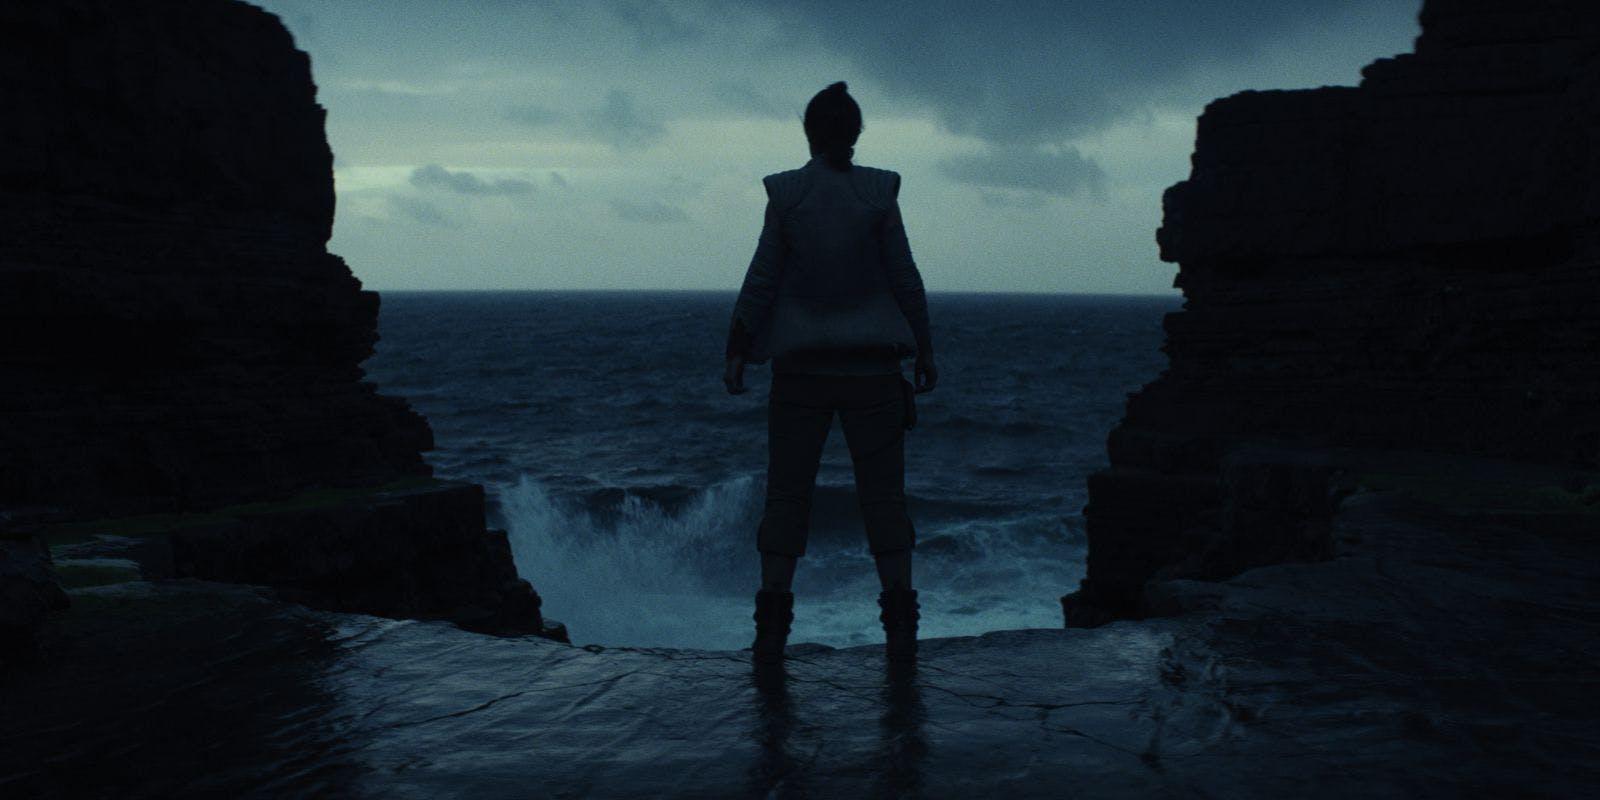 Star-Wars-The-Last-Jedi-teaser-trailer-Rey-on-Ahch-To.jpg